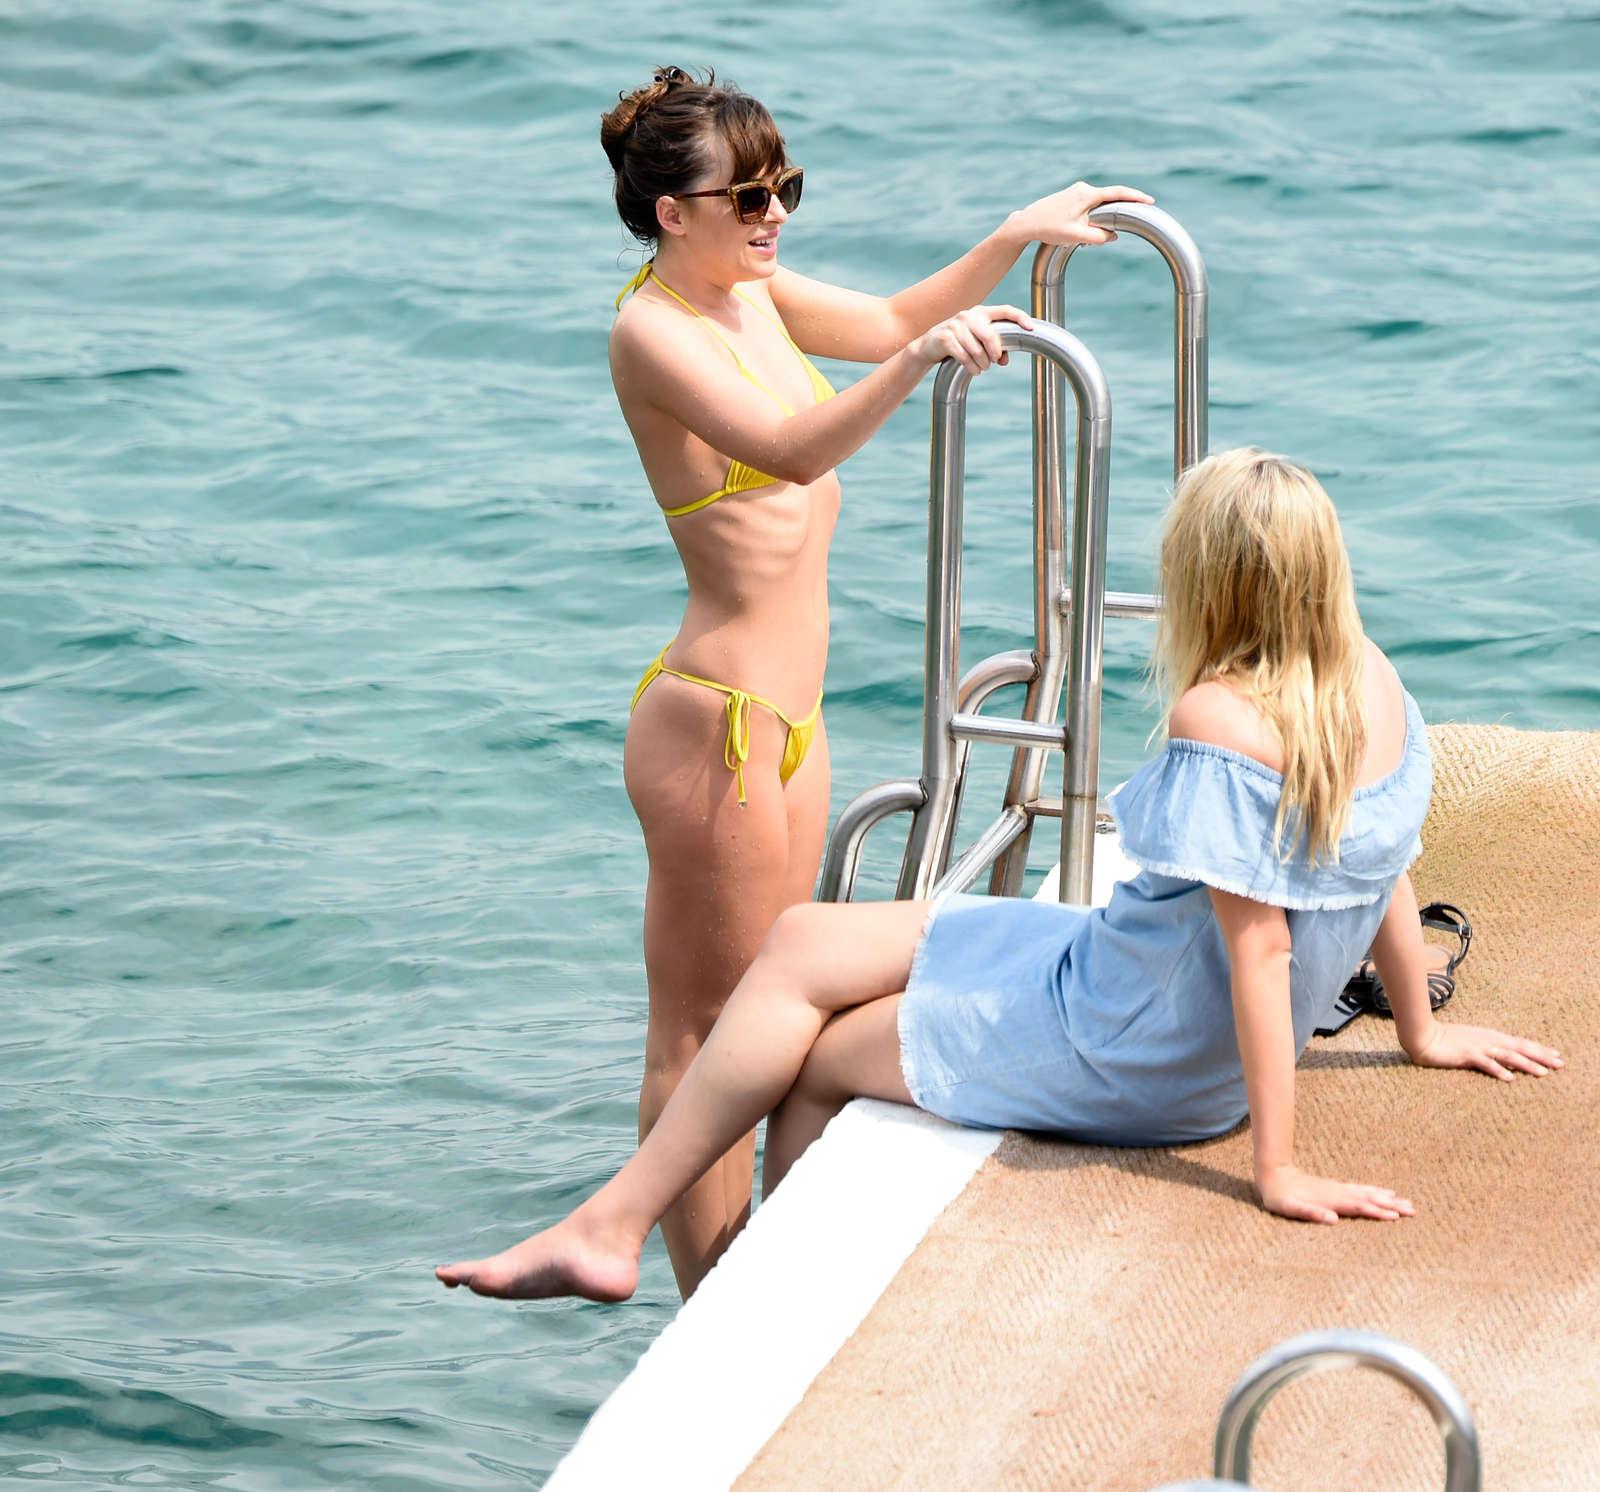 Dakota Johnson 2016 : Dakota Johnson in Yellow Bikini 2016 -09